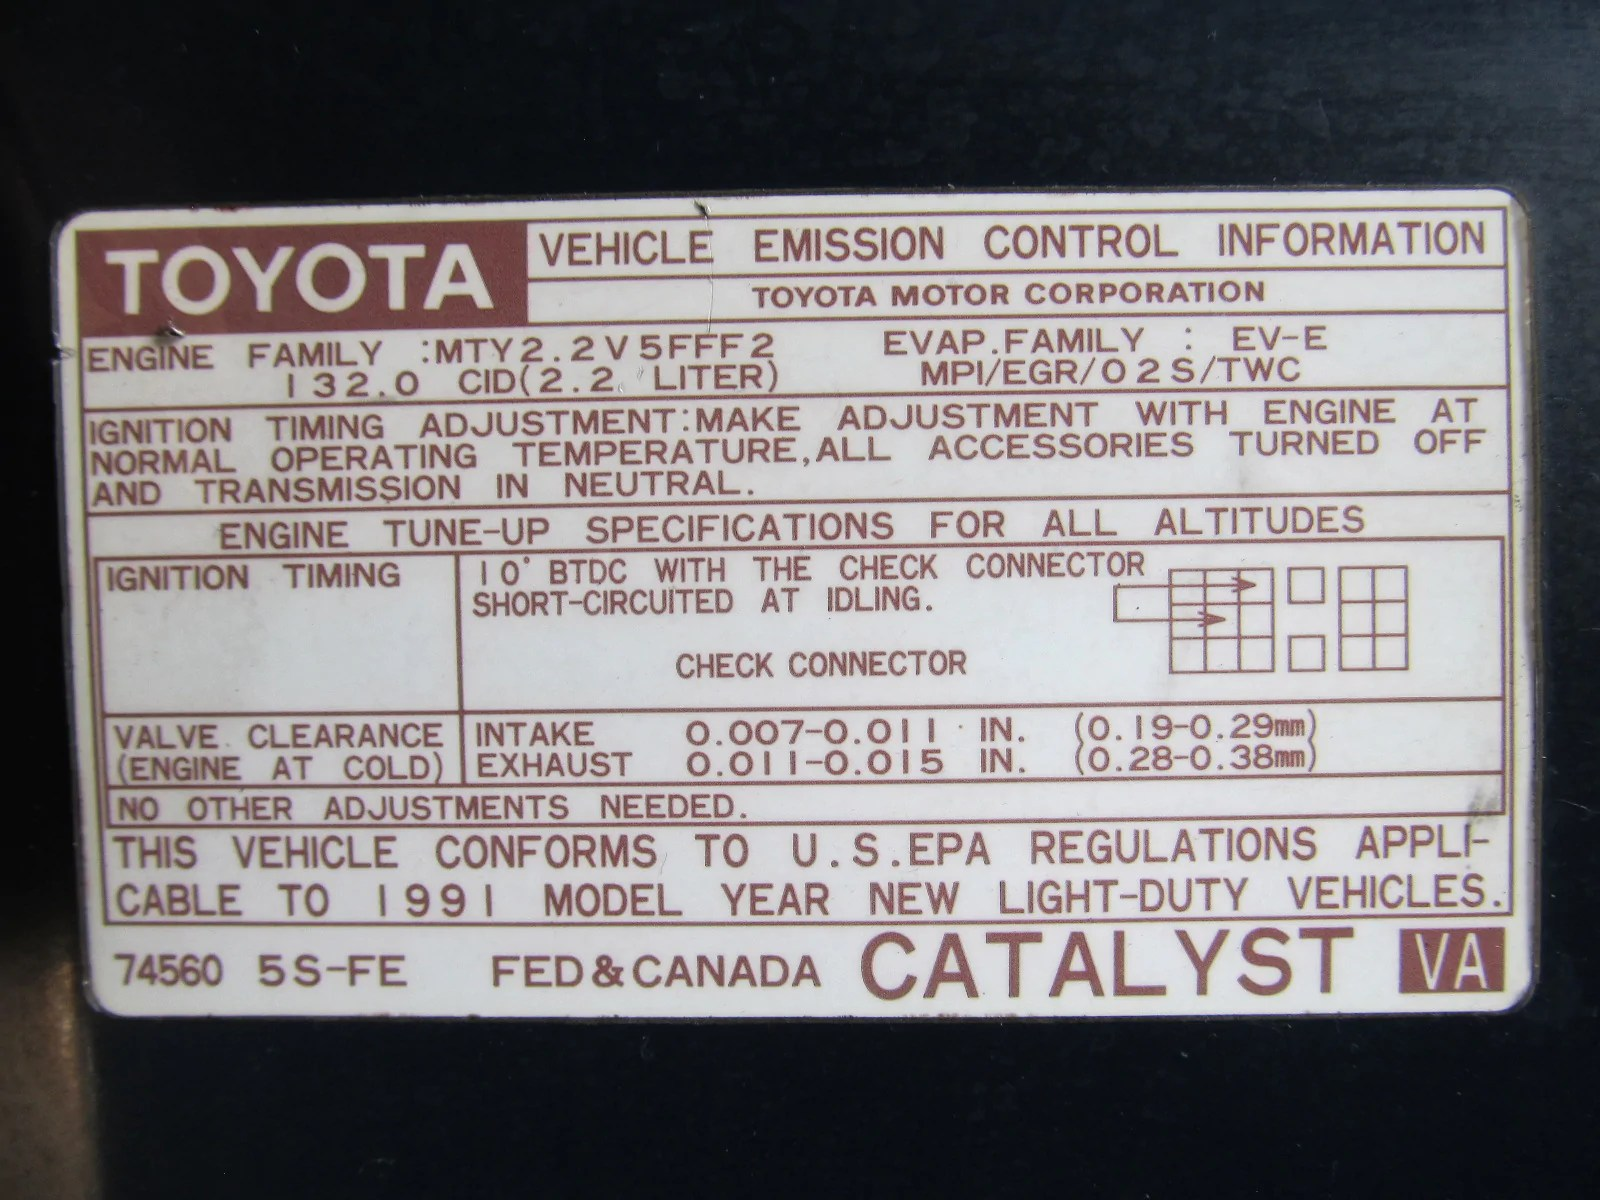 medium resolution of 91 mr2 2 2l 5sfe at vehicle emission control information diagram